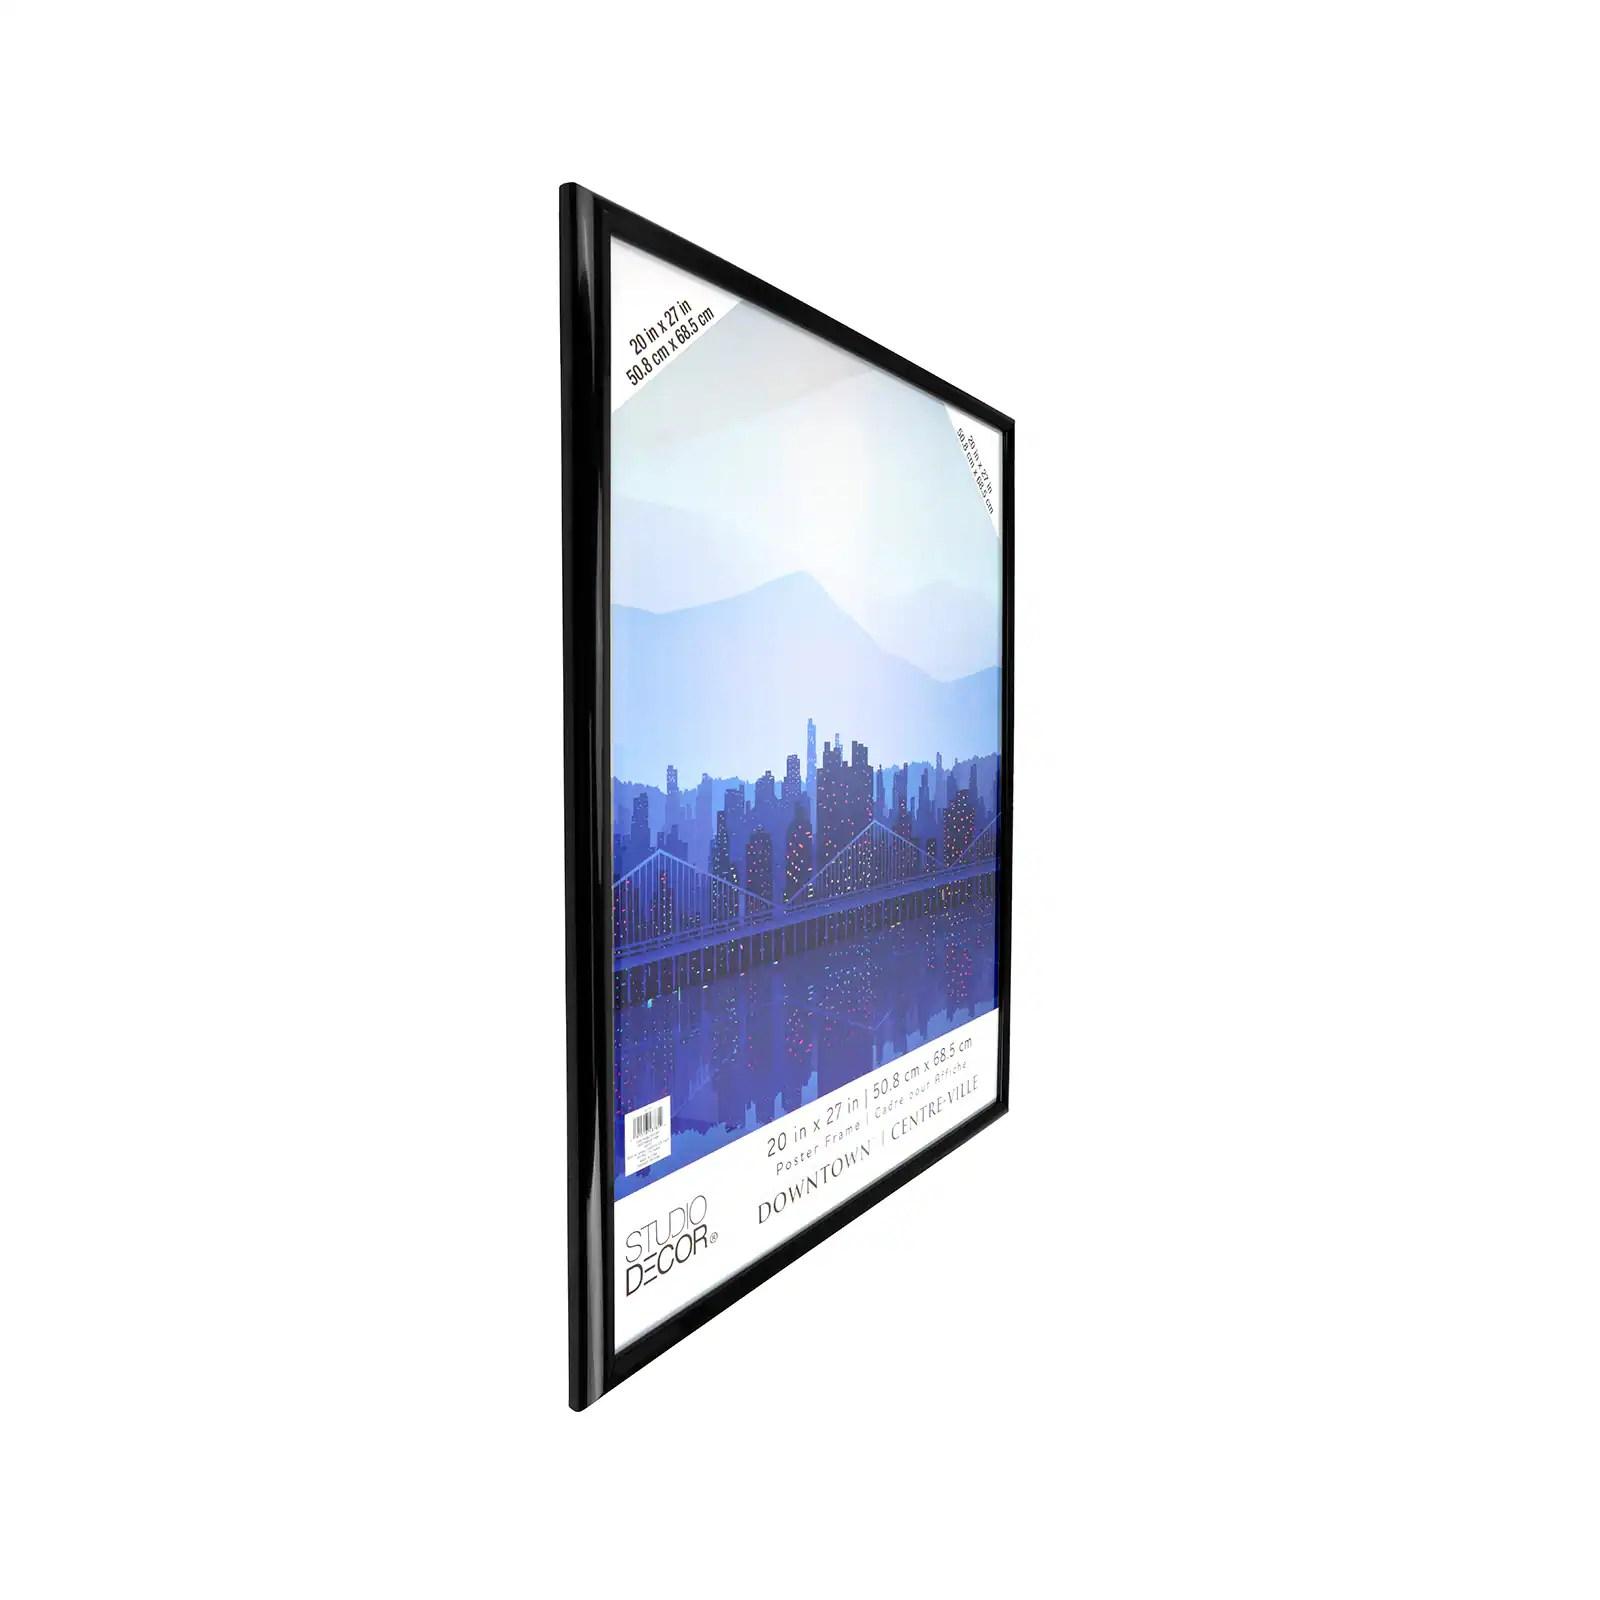 poster frame by studio decor